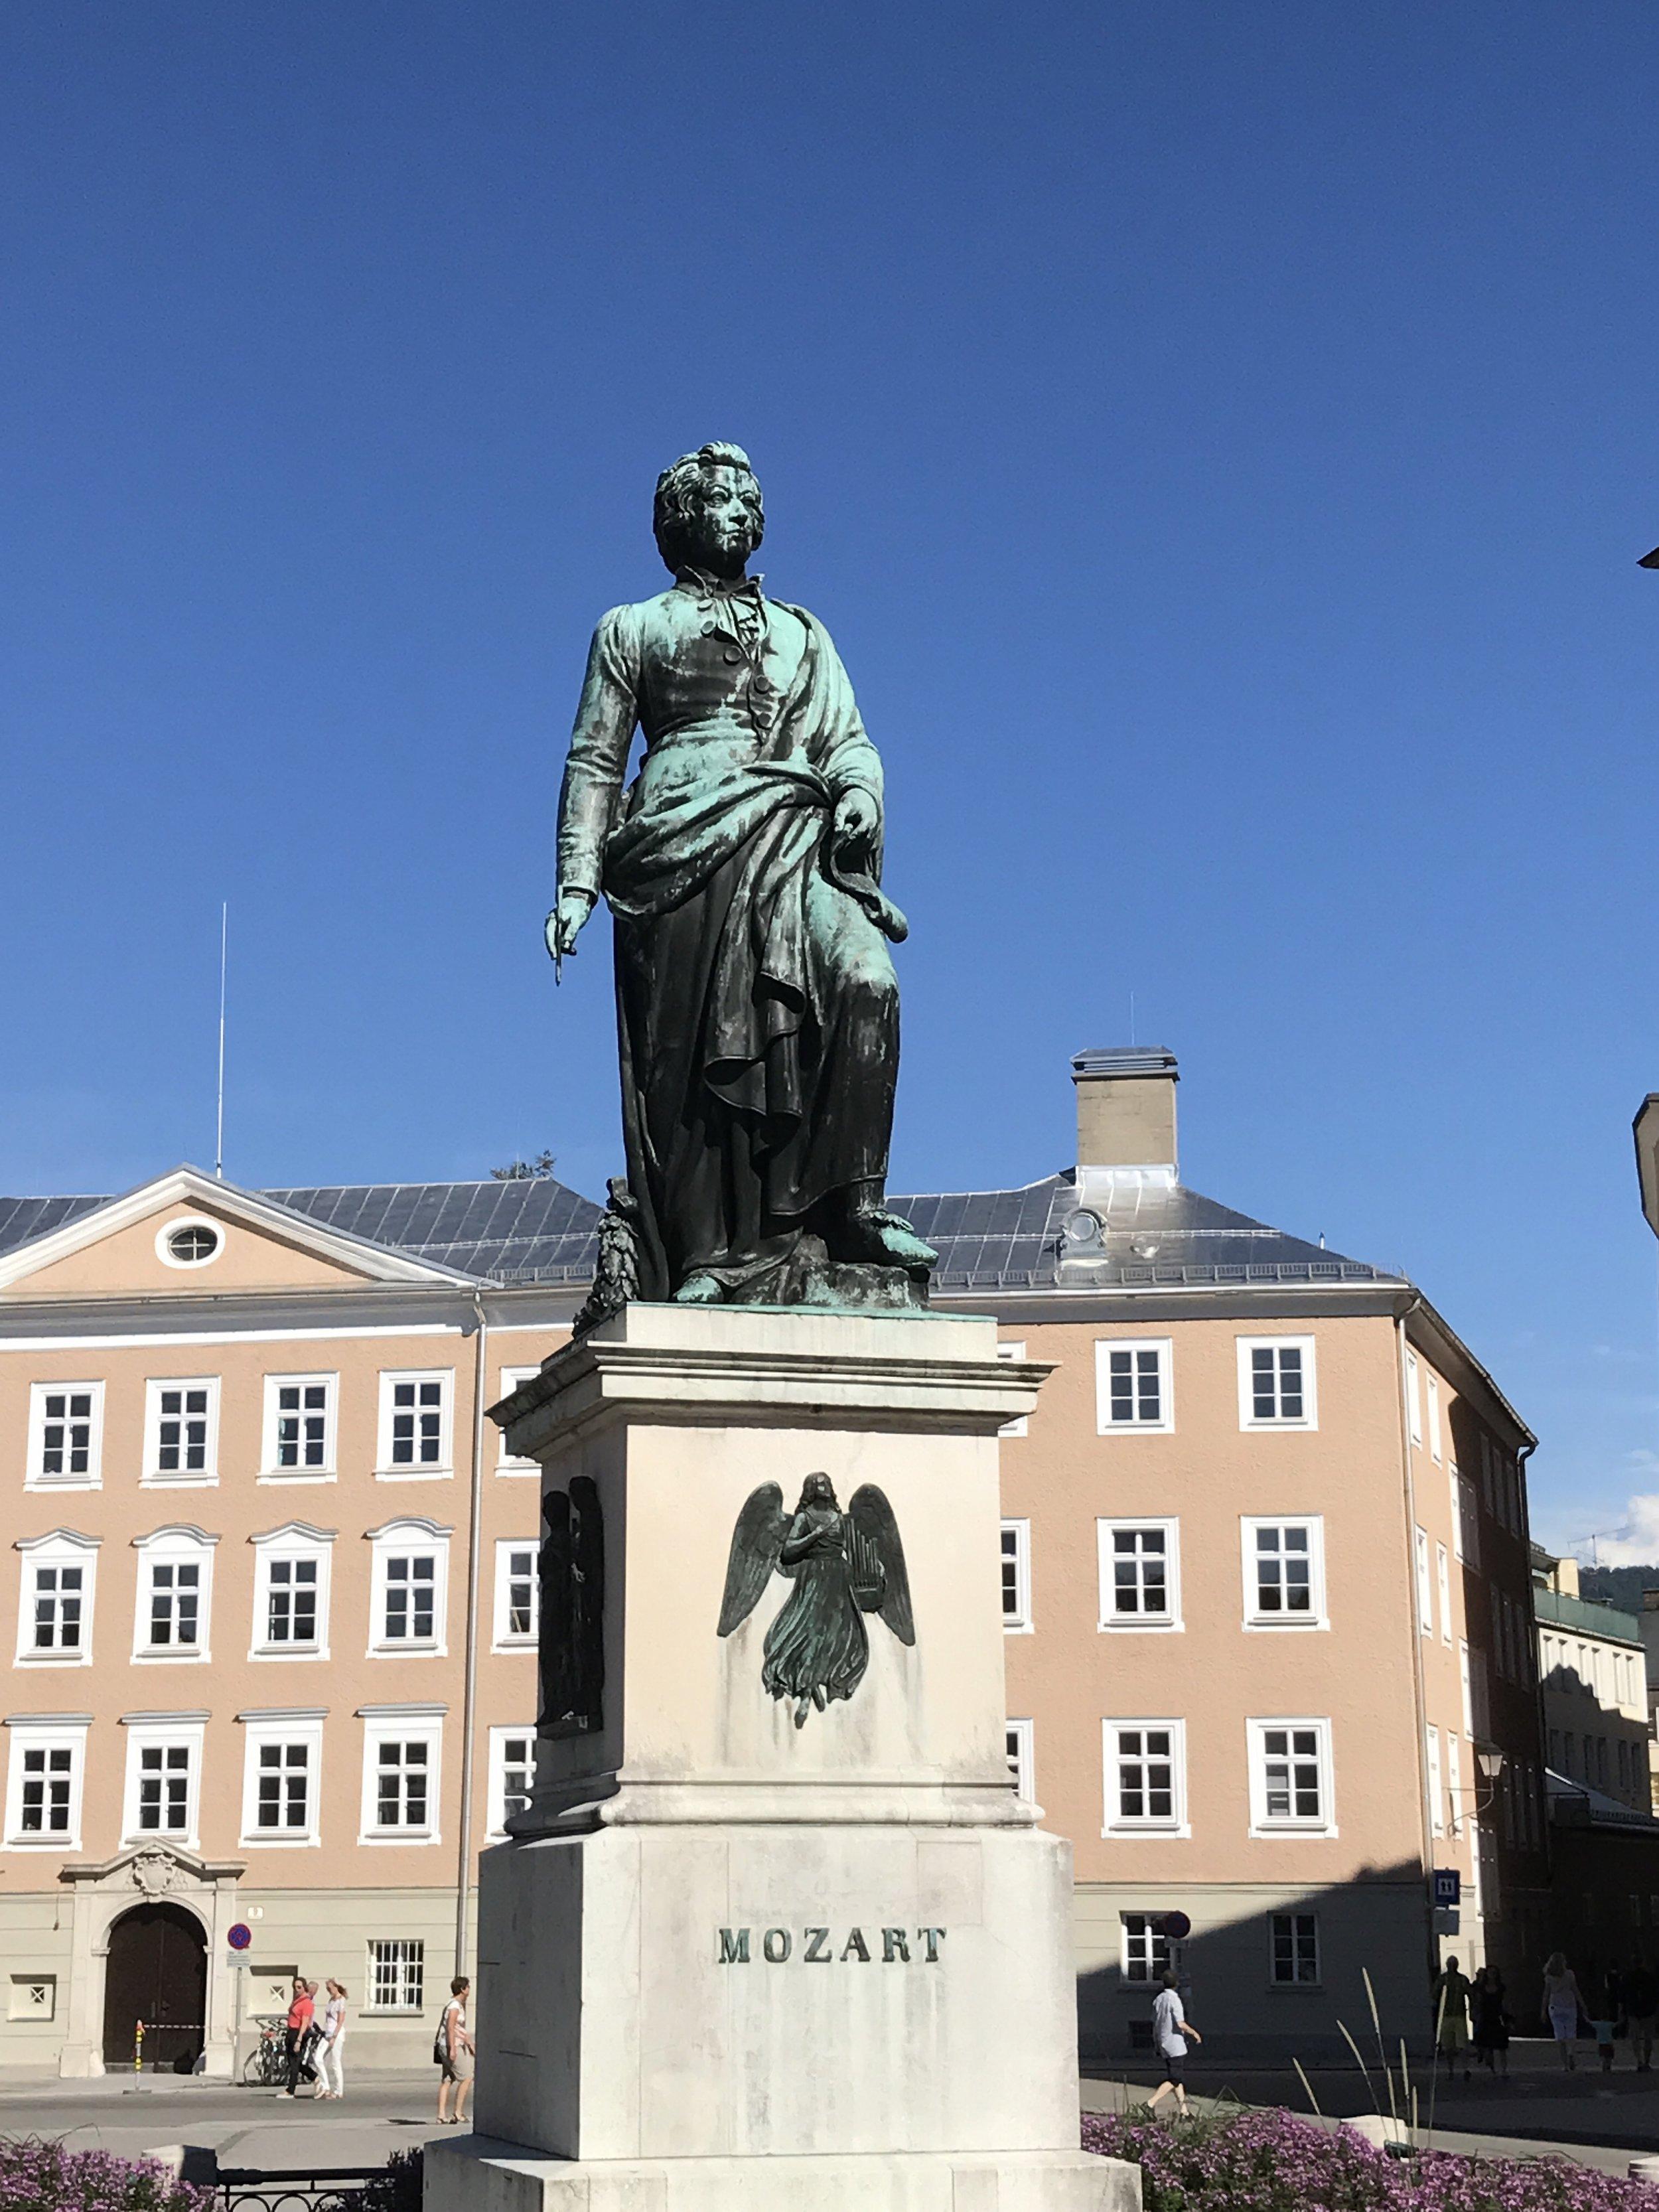 The Statue of Mozart in Mozartplatz